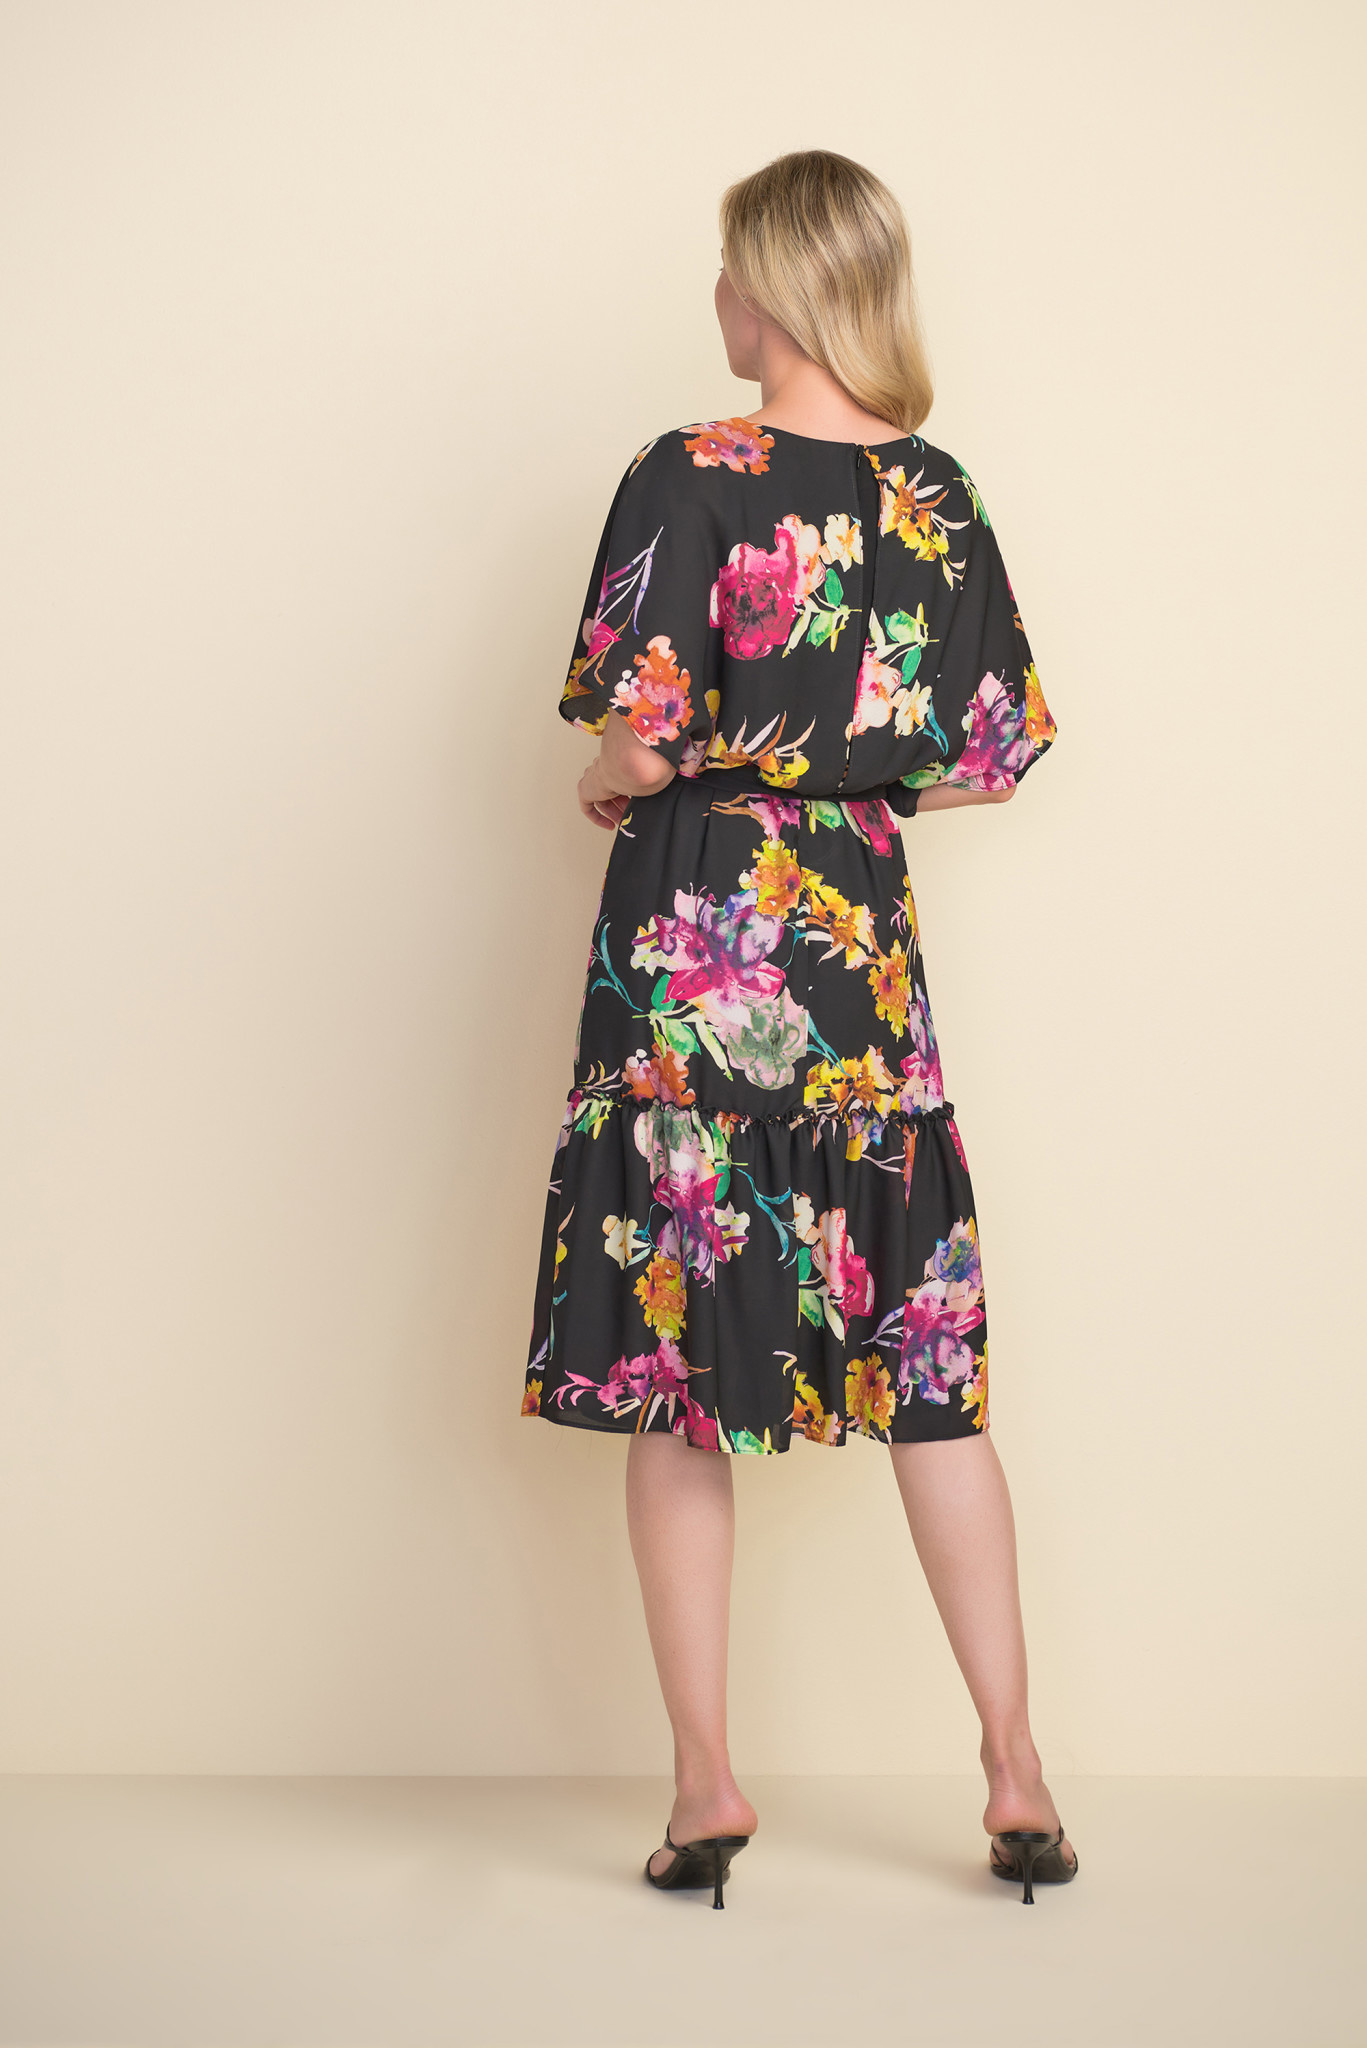 Floral Chiffon Tiered Dress